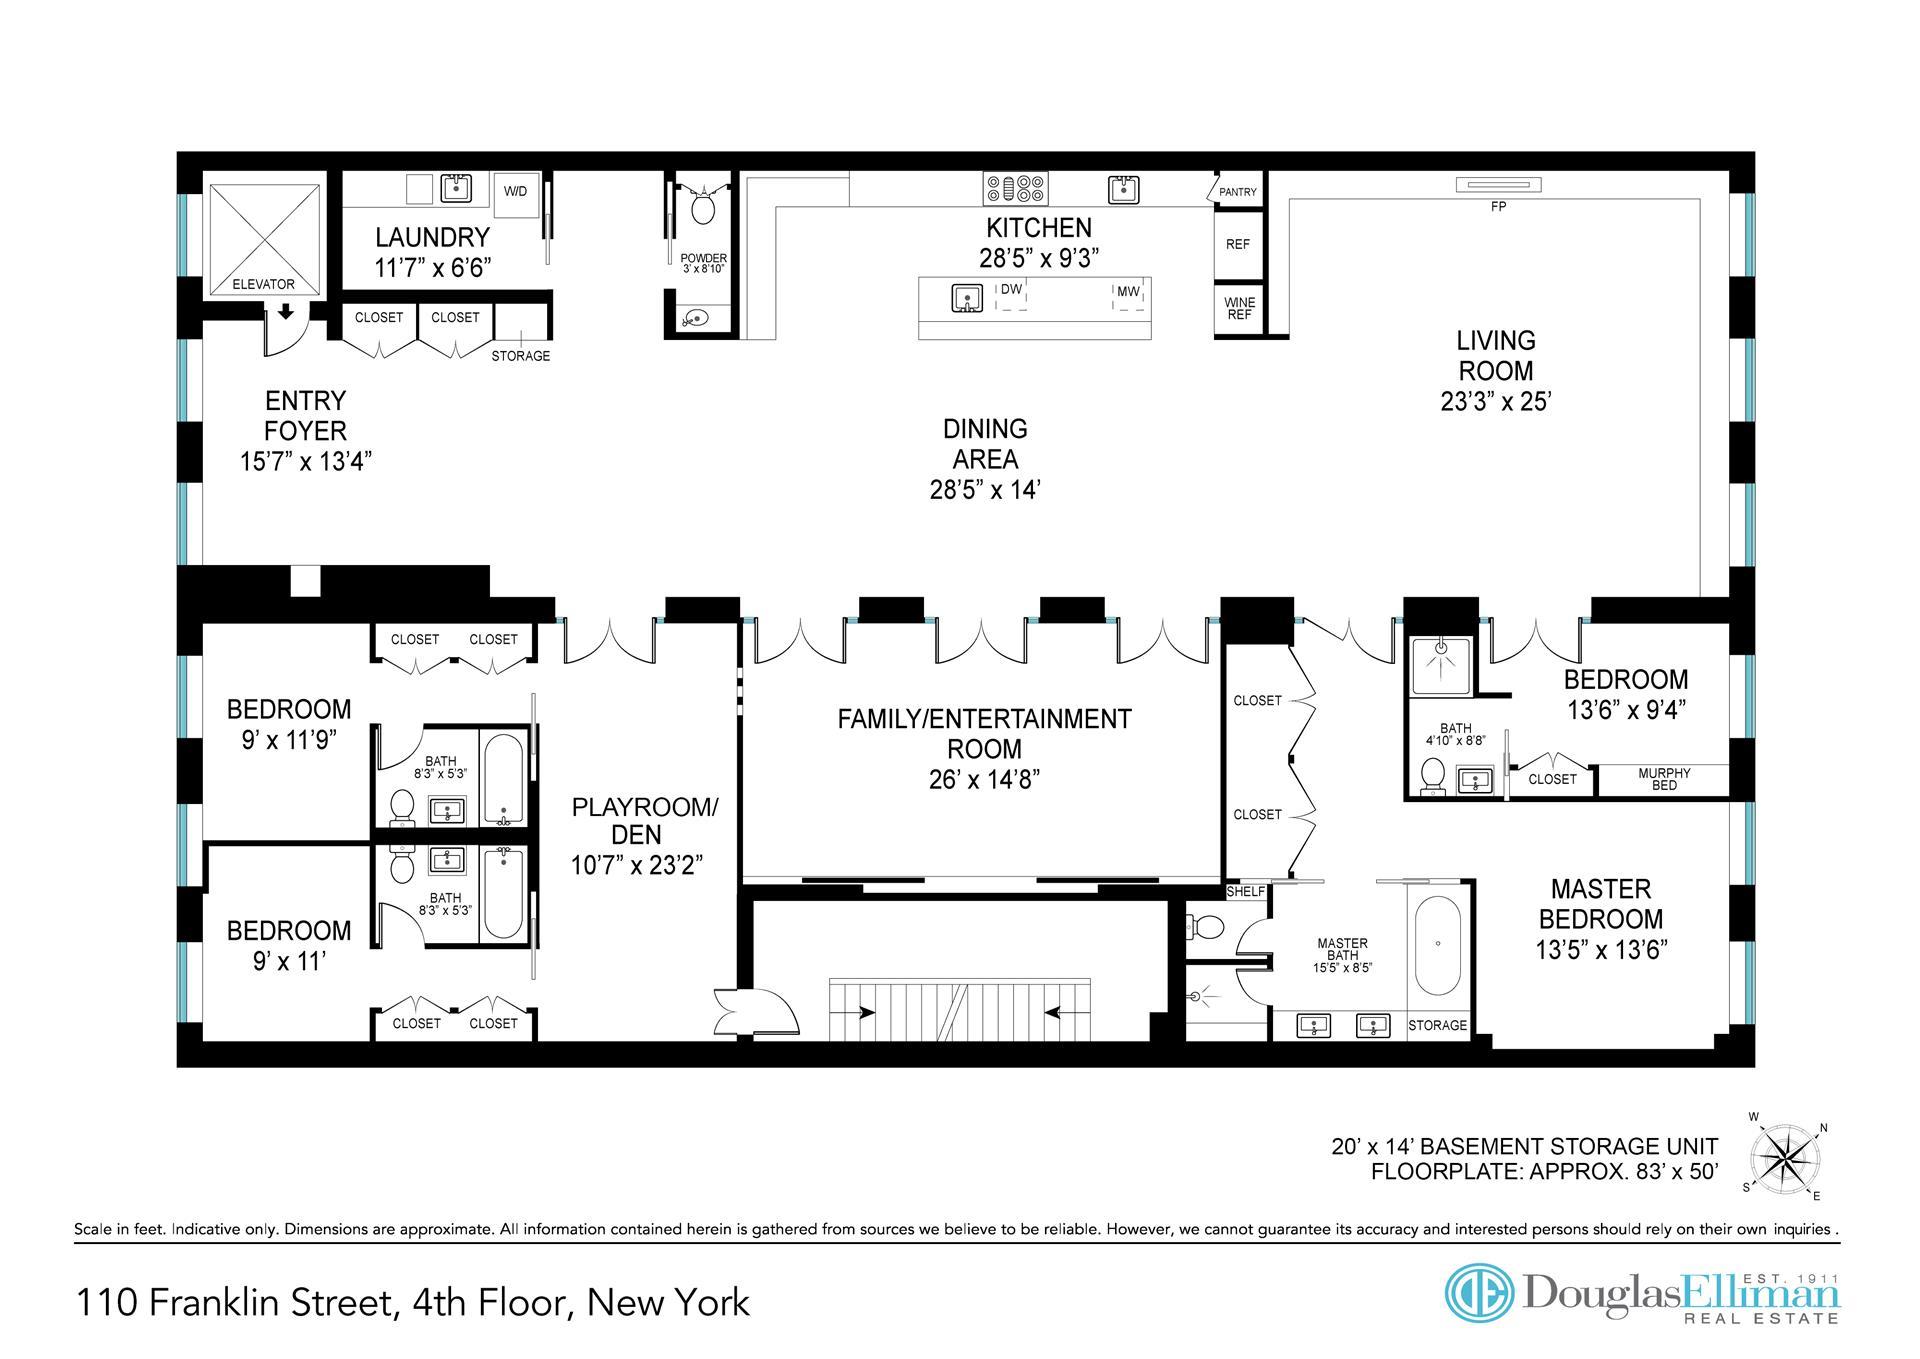 Floor plan of 108 Franklin St, 4THFLR - TriBeCa, New York